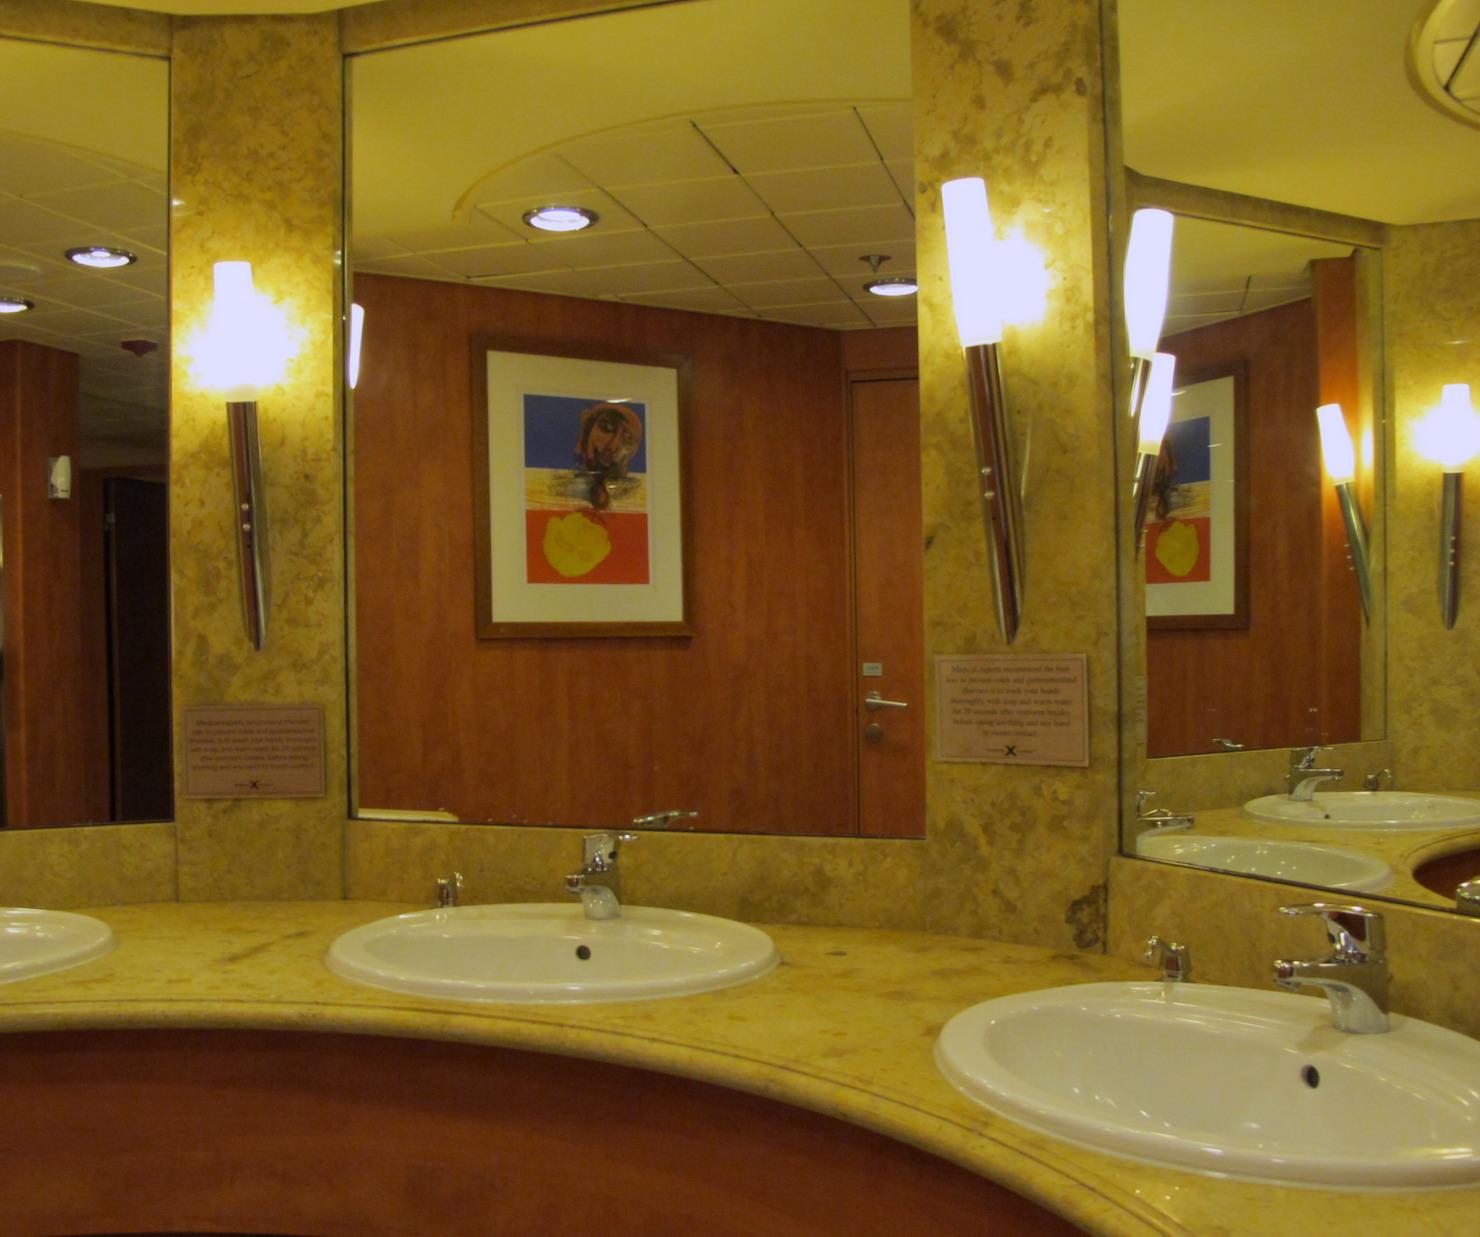 Inside The Men 39 S Public Restroom Near The Ship 39 S Theater In The Bow. April 2013 Jazz Toilet Jazz Toilet Public Bathrooms Near Me